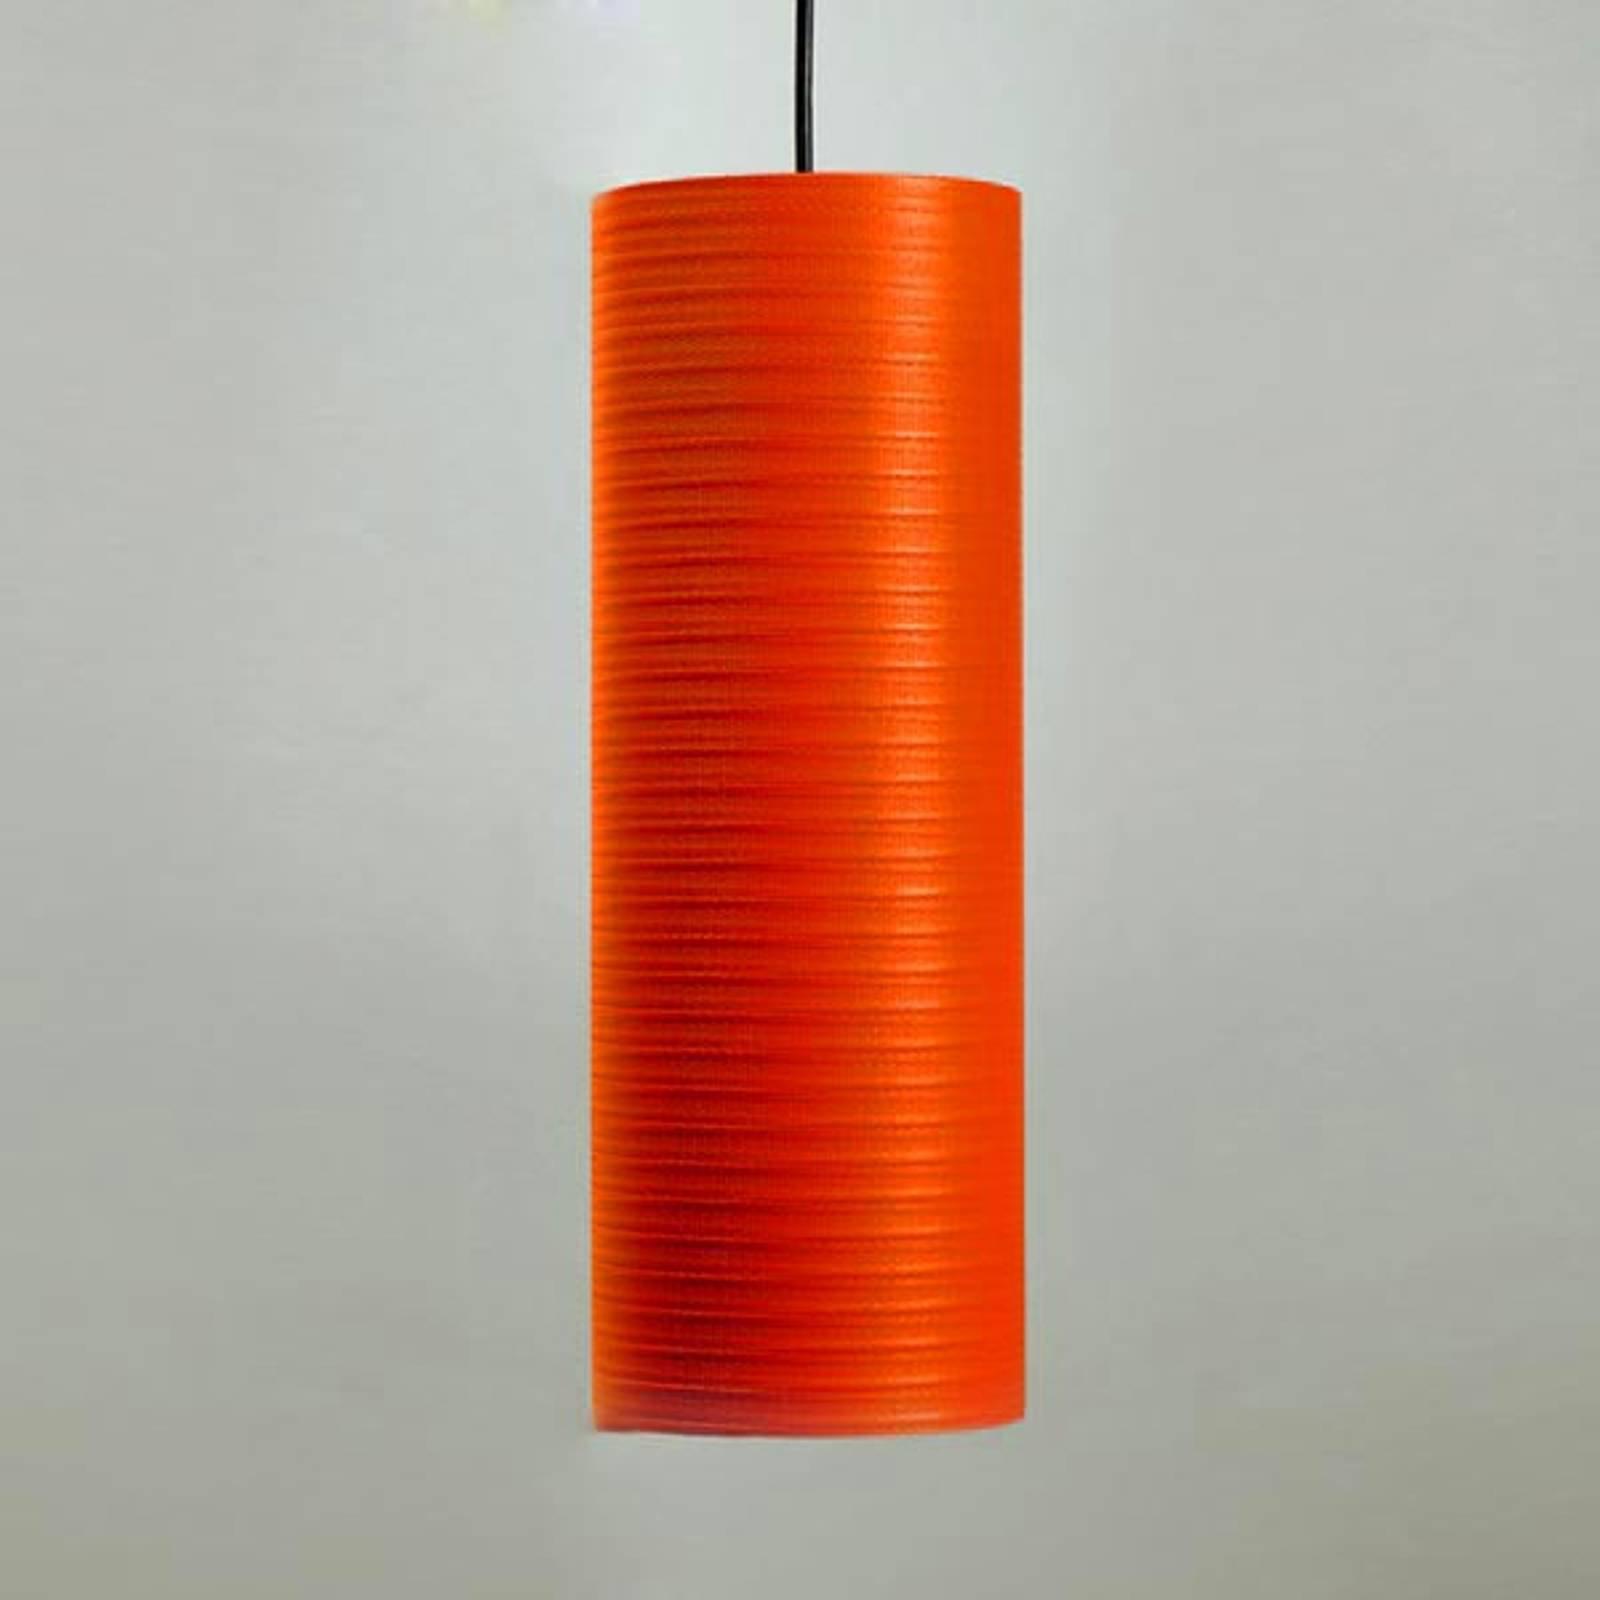 Tube pendellampe, 30 cm, rød